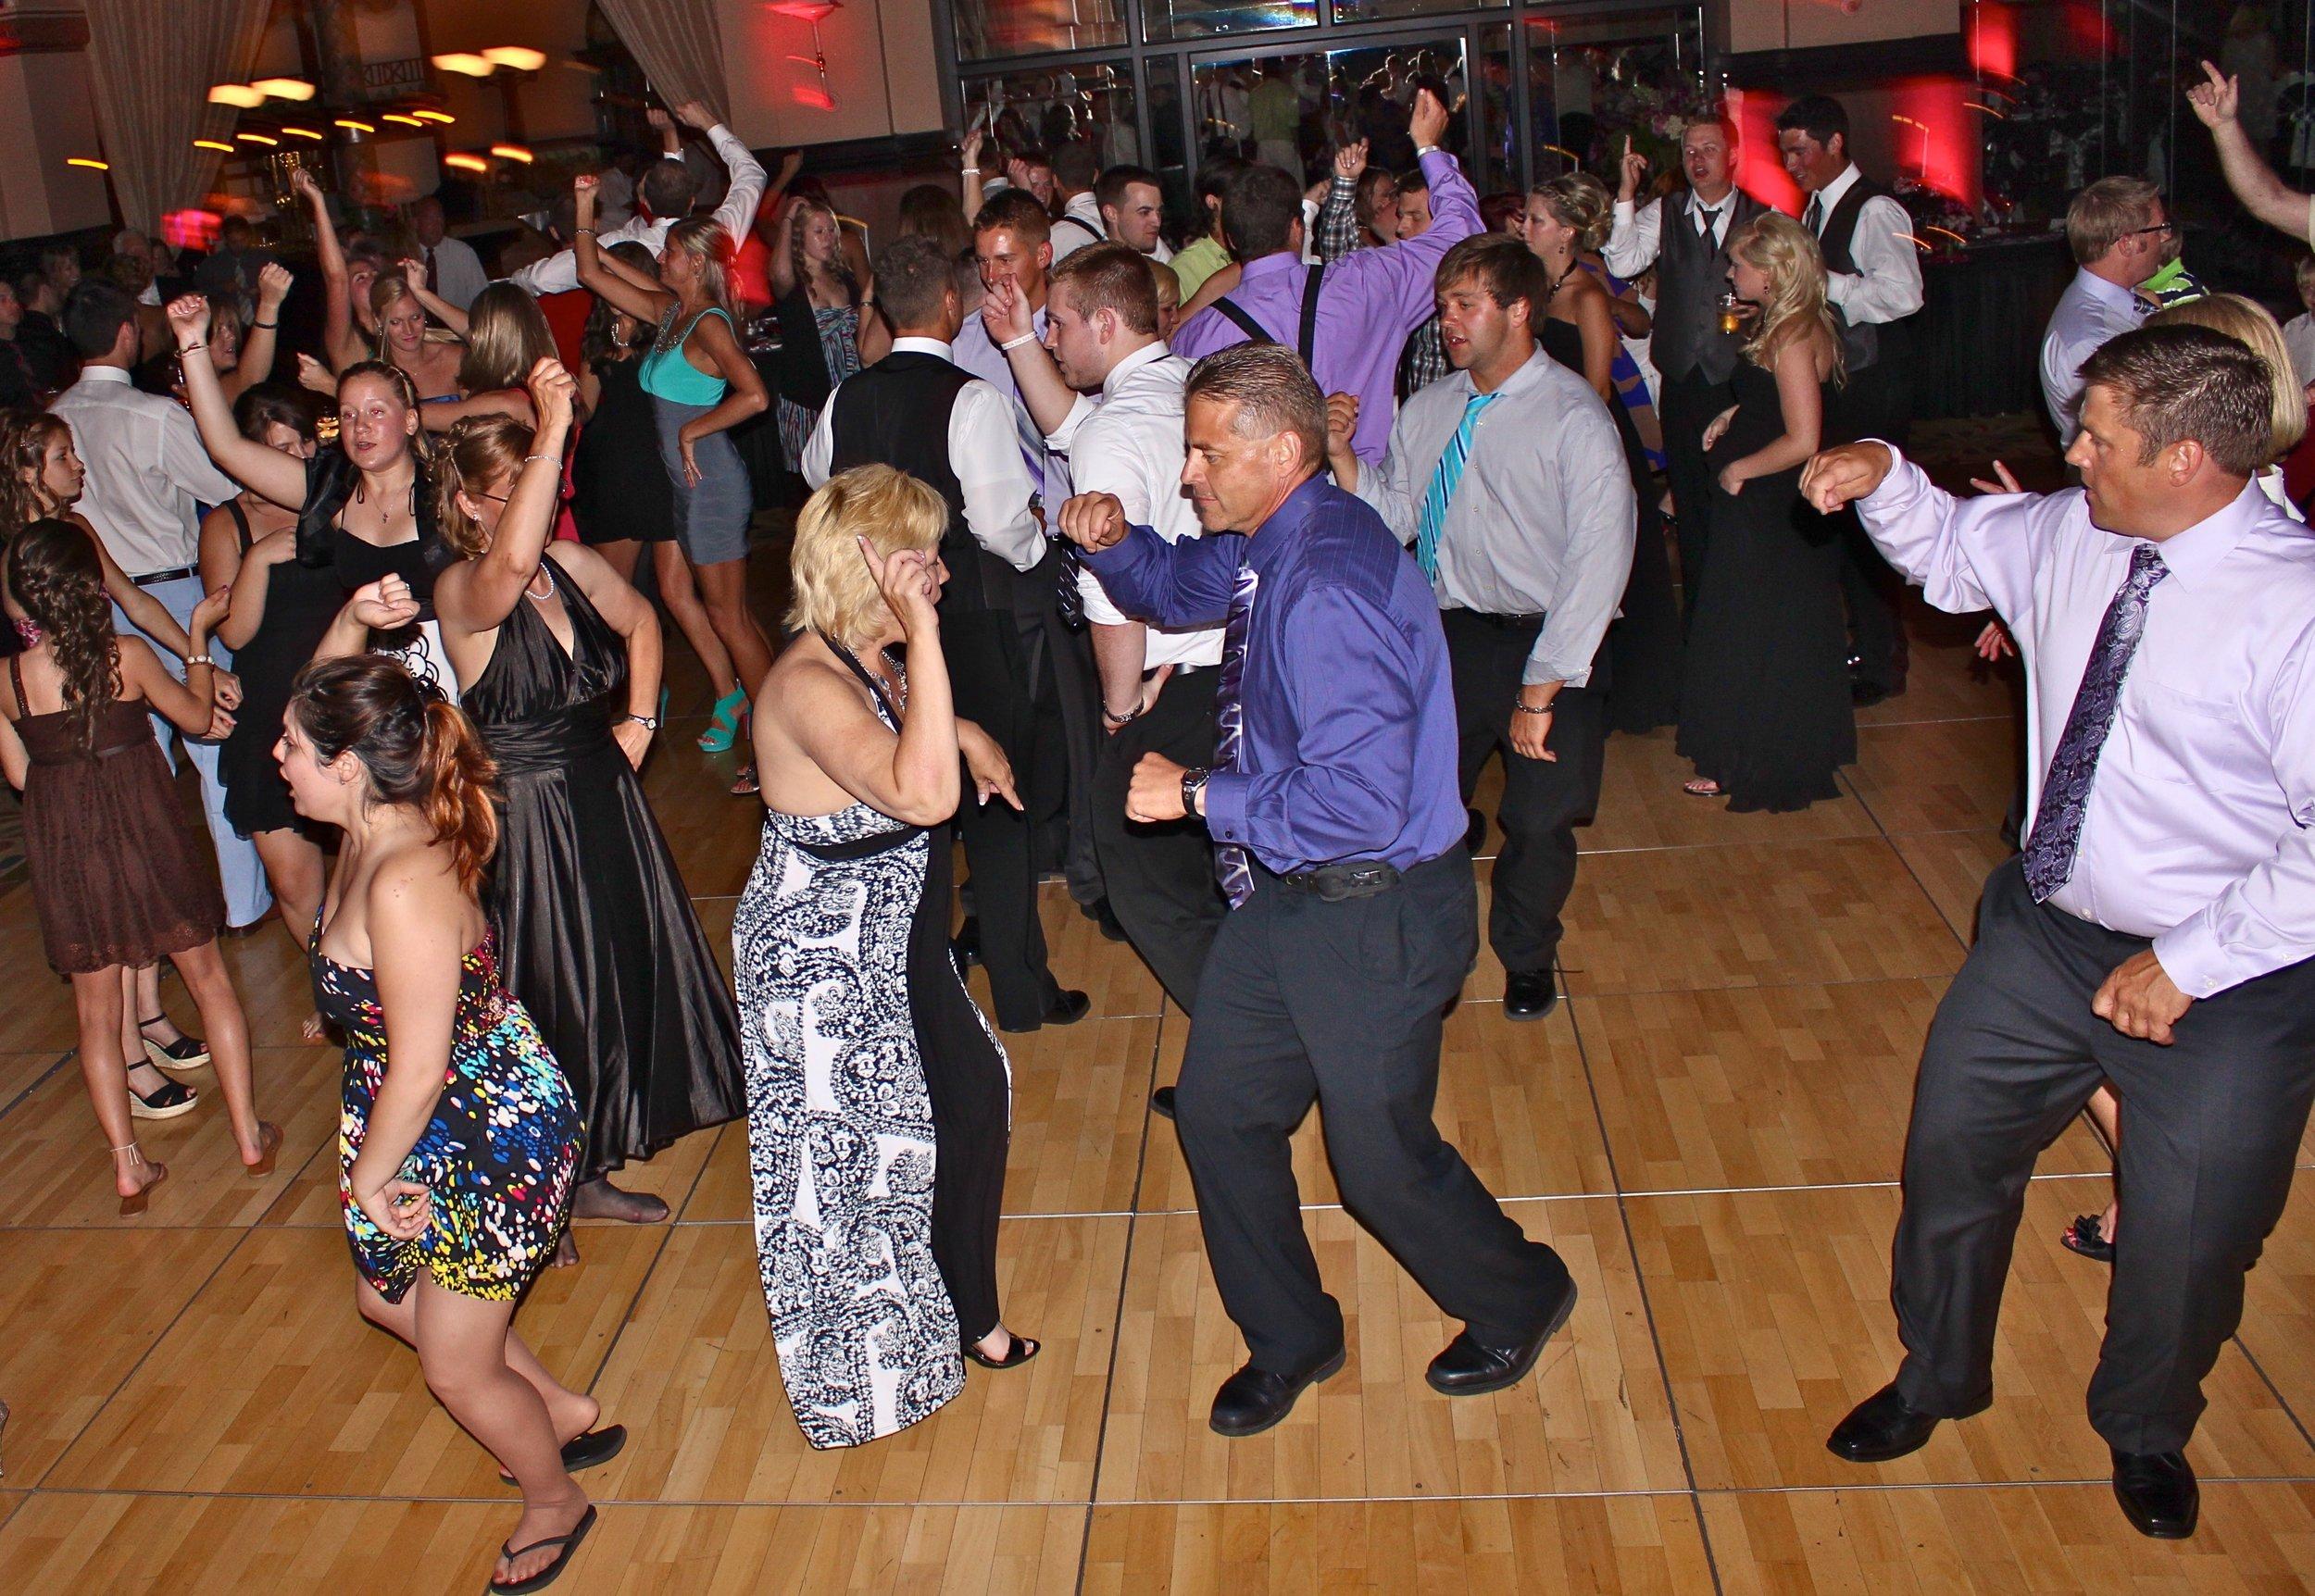 Open Dancing by Indiana DJ Jim Cerone